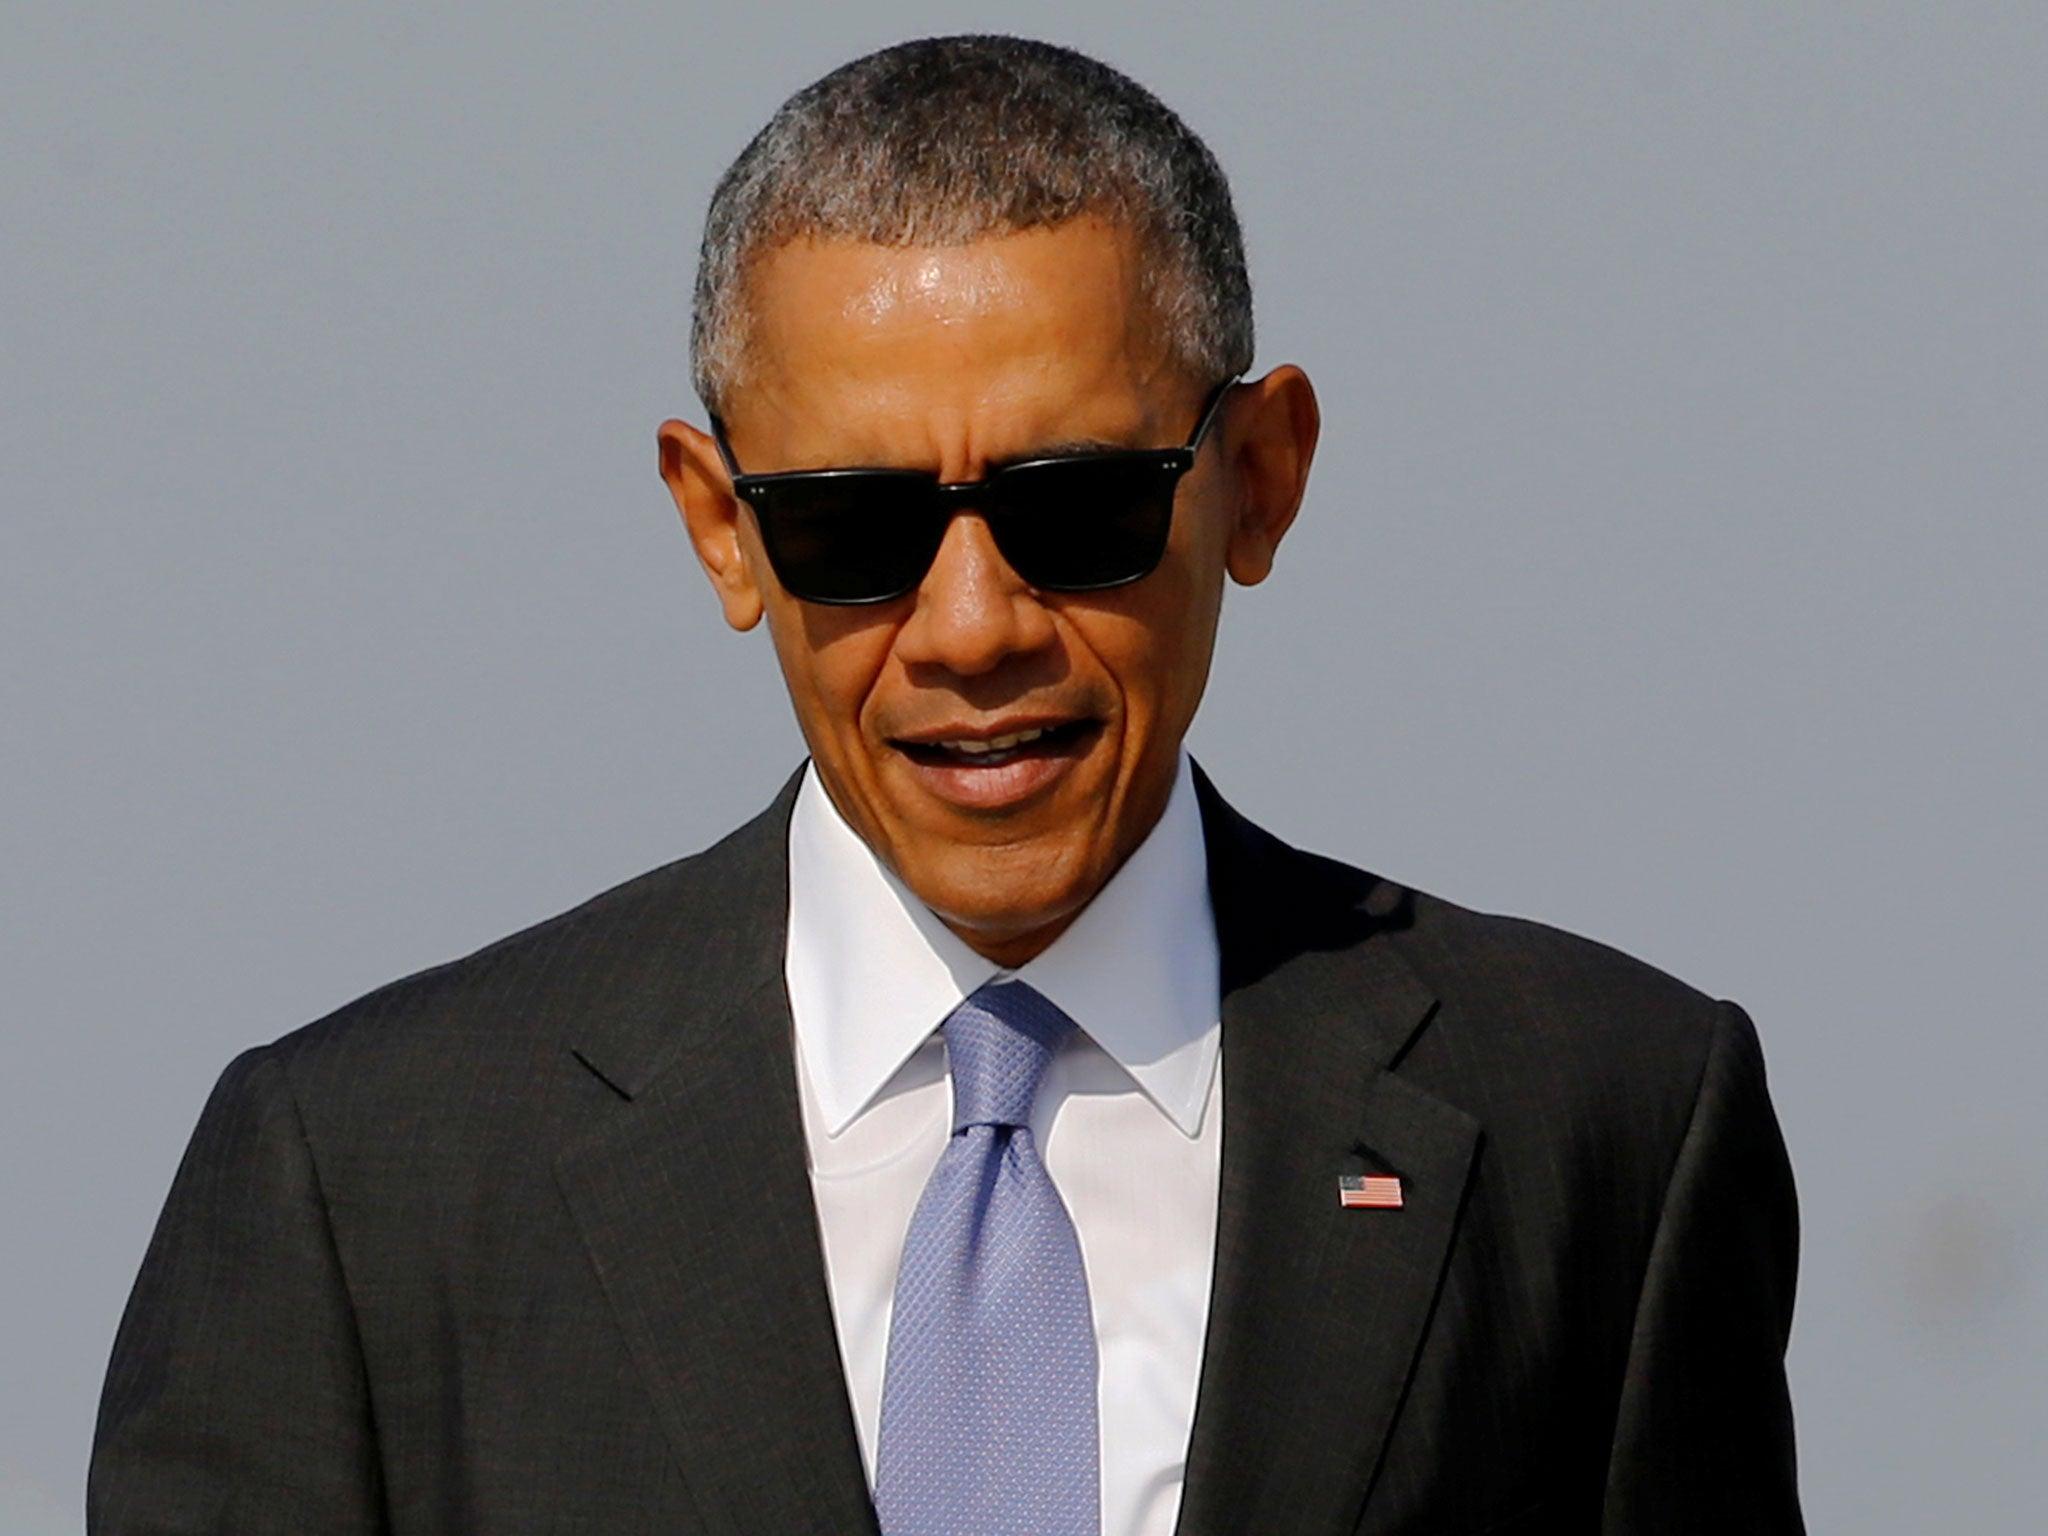 obama - photo #34